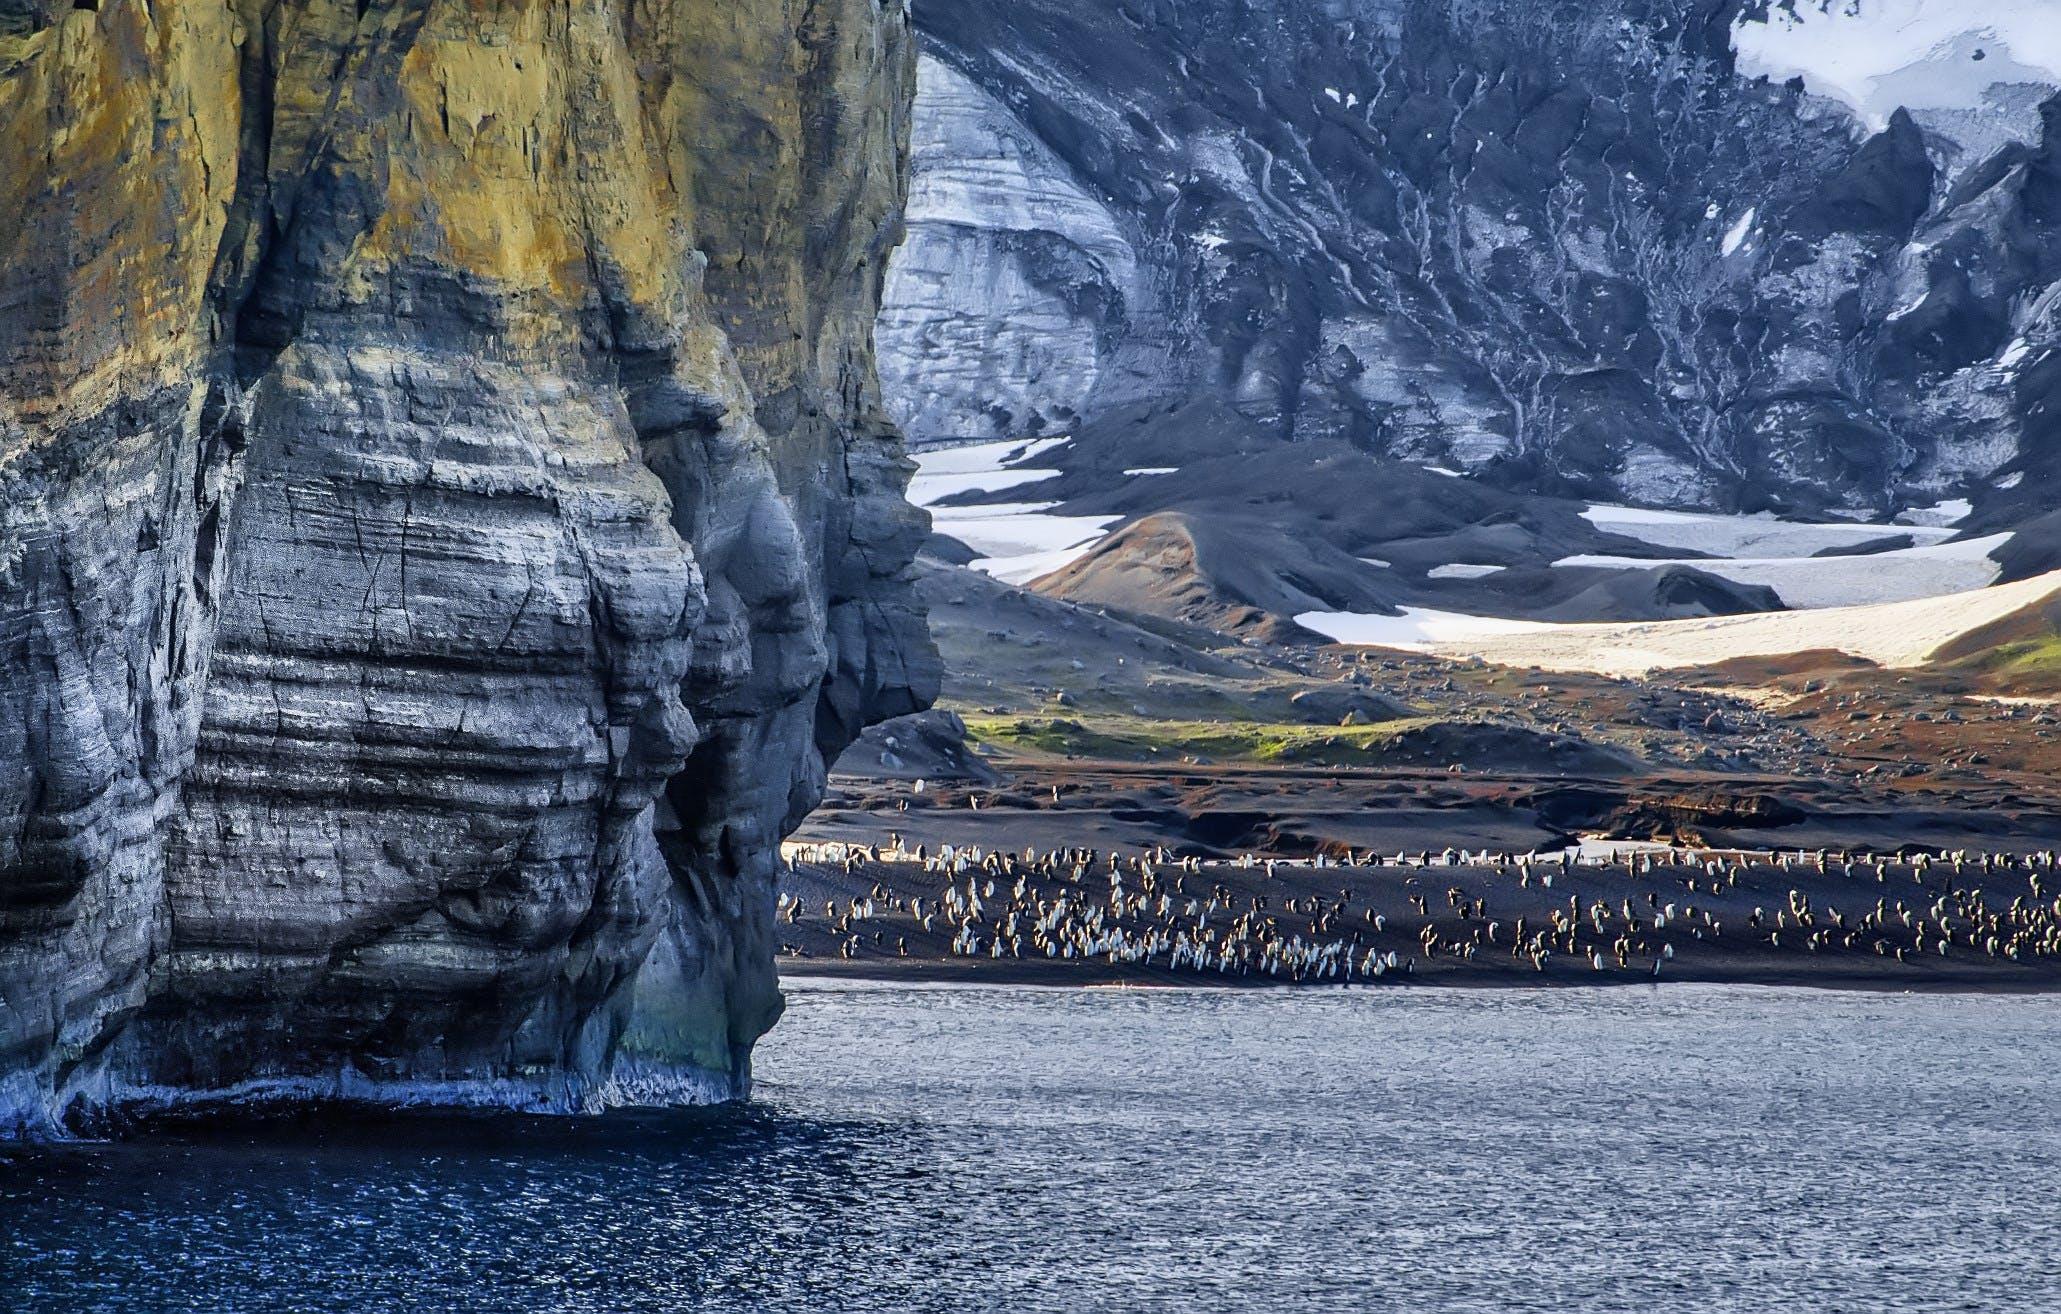 Gray Stone Mountain Beside Body of Water